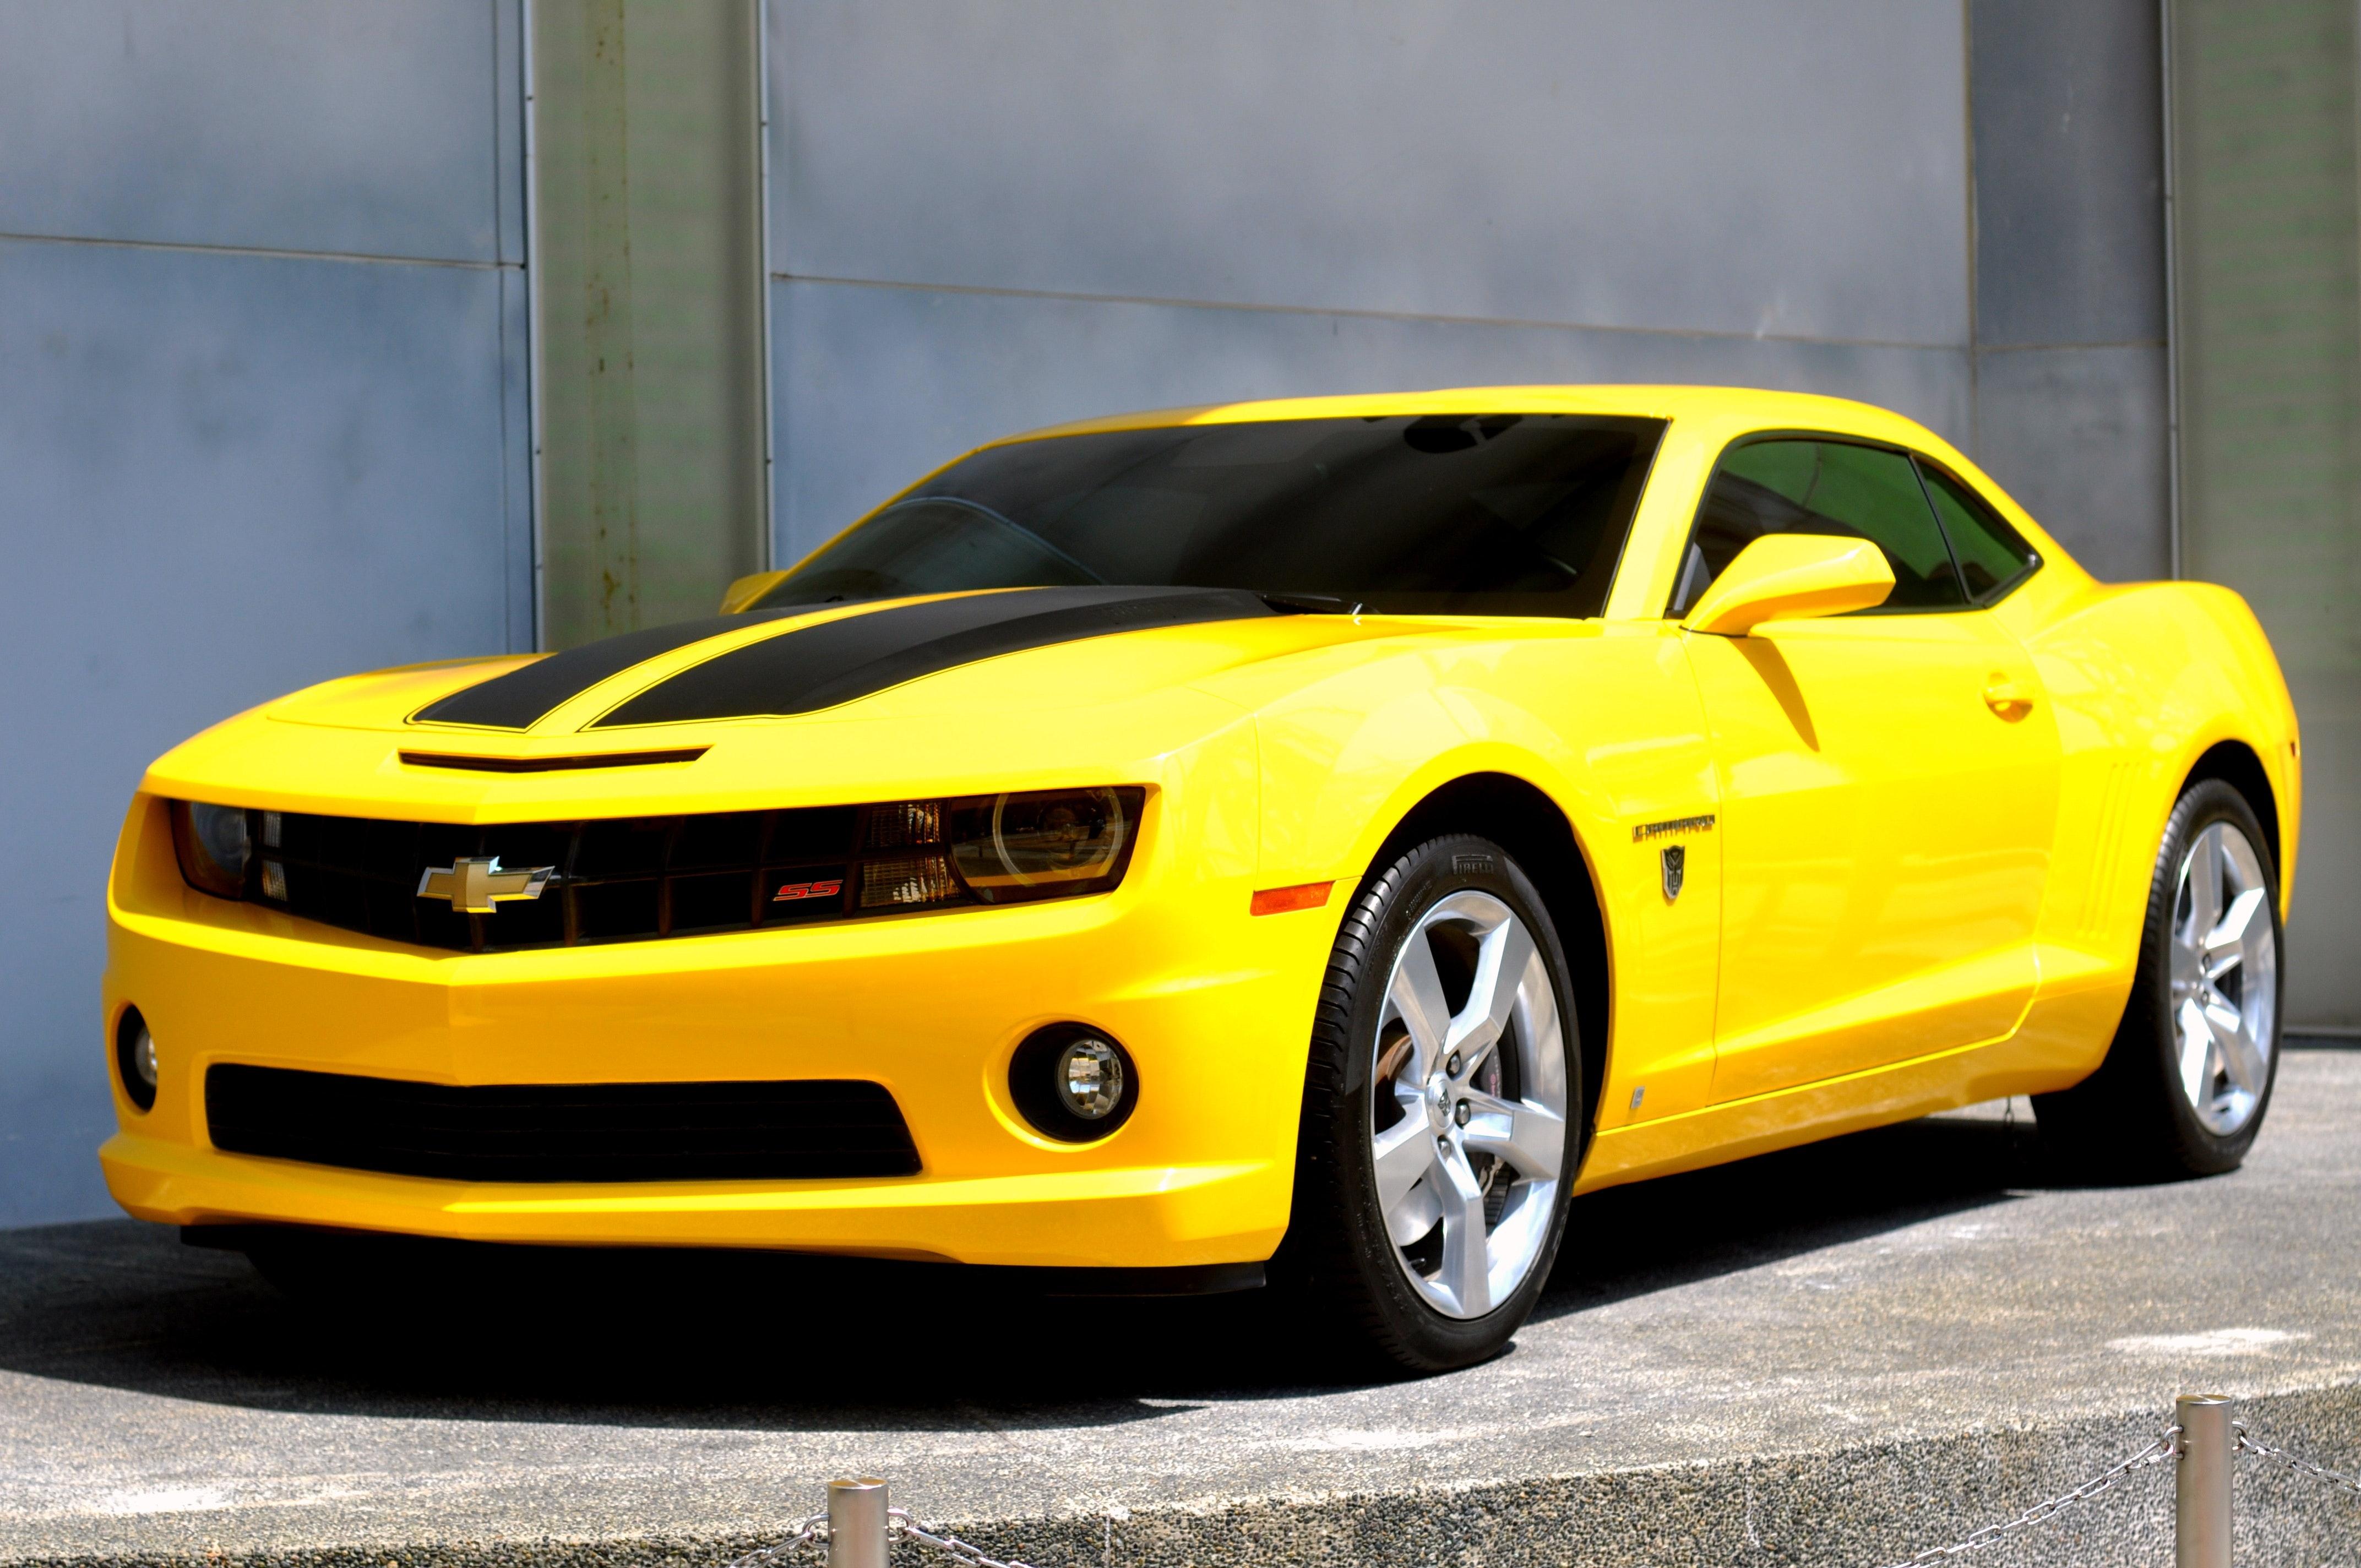 Free stock photo of bumblebee camaro chevorlet - Transformers bumblebee car wallpaper ...